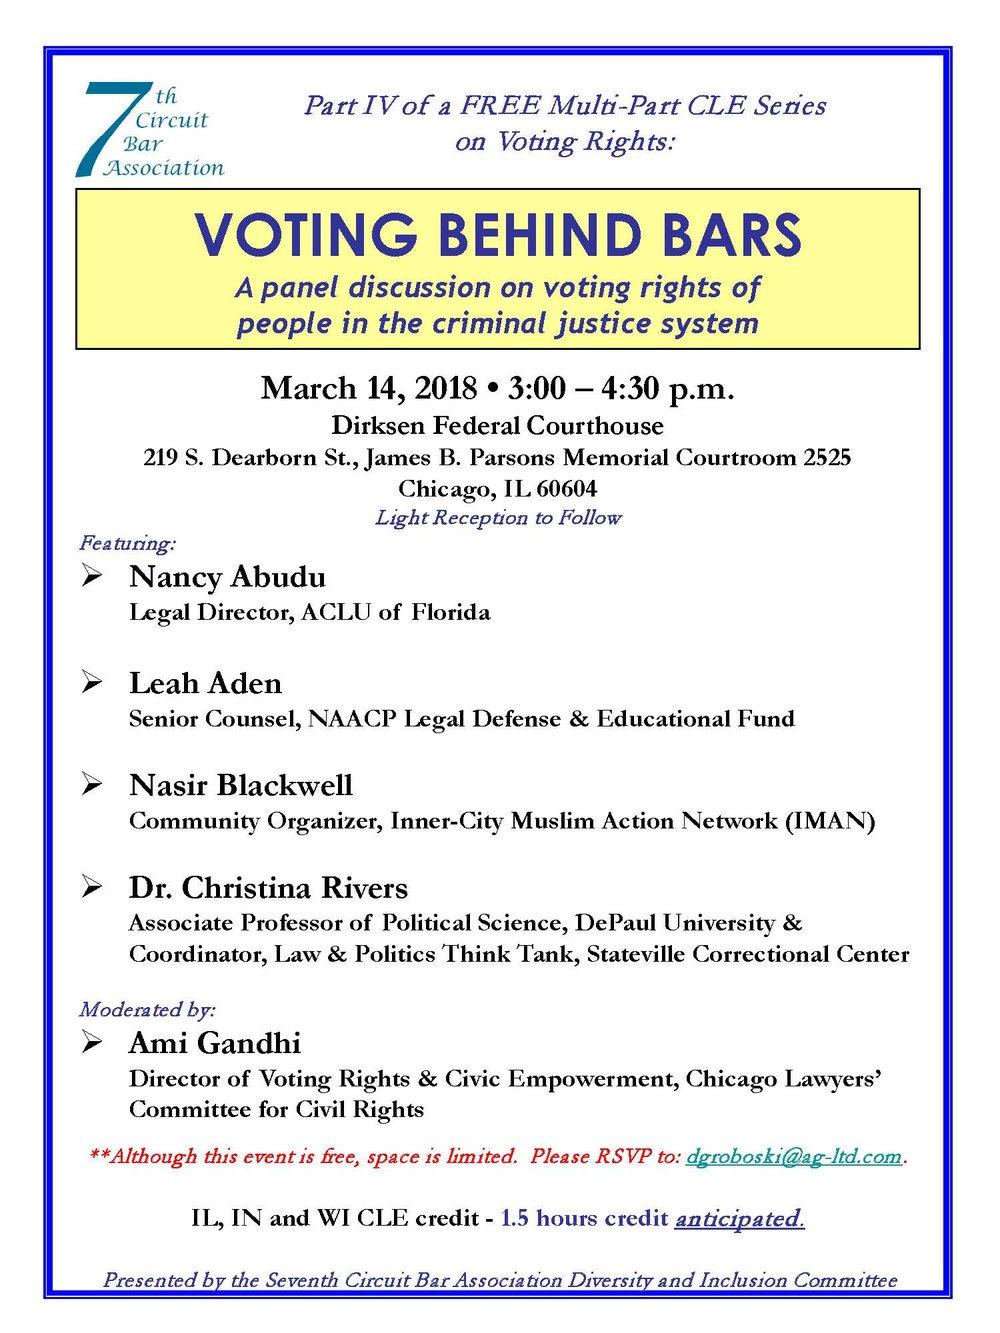 2018-03-14 Voting Rights Panel flyer - FINAL.jpg